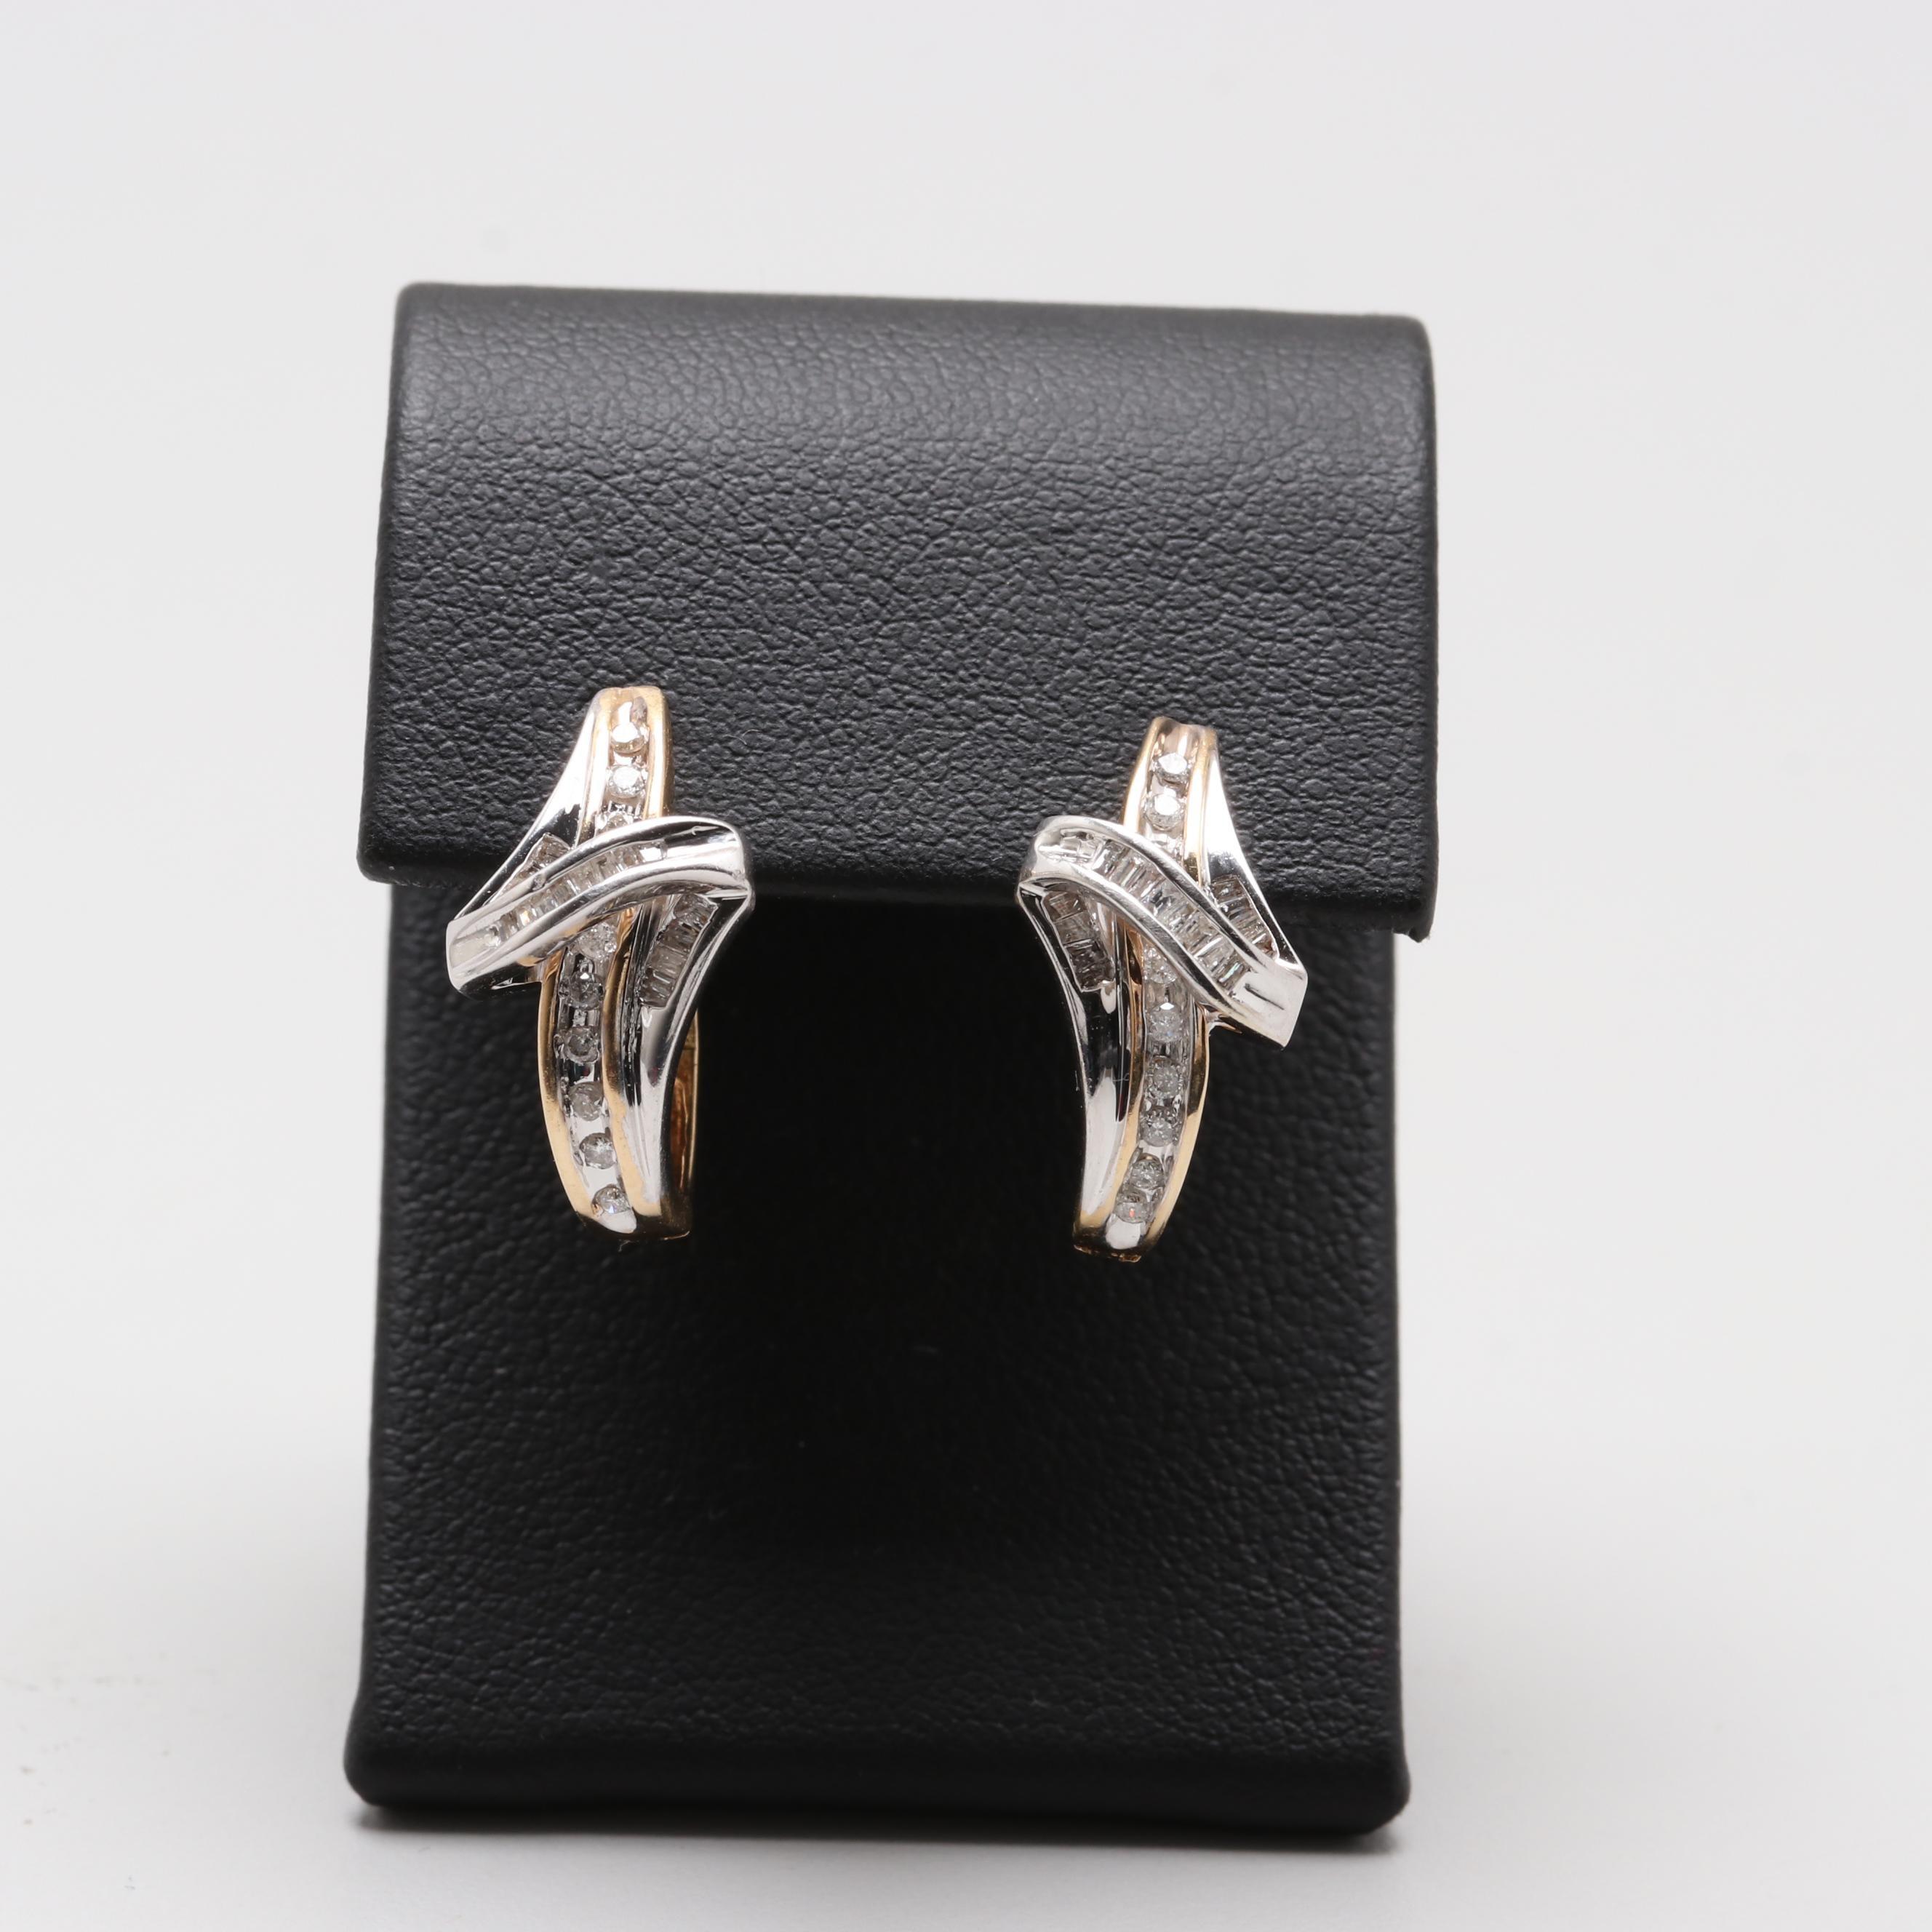 14K Yellow and White Gold Diamond Earrings